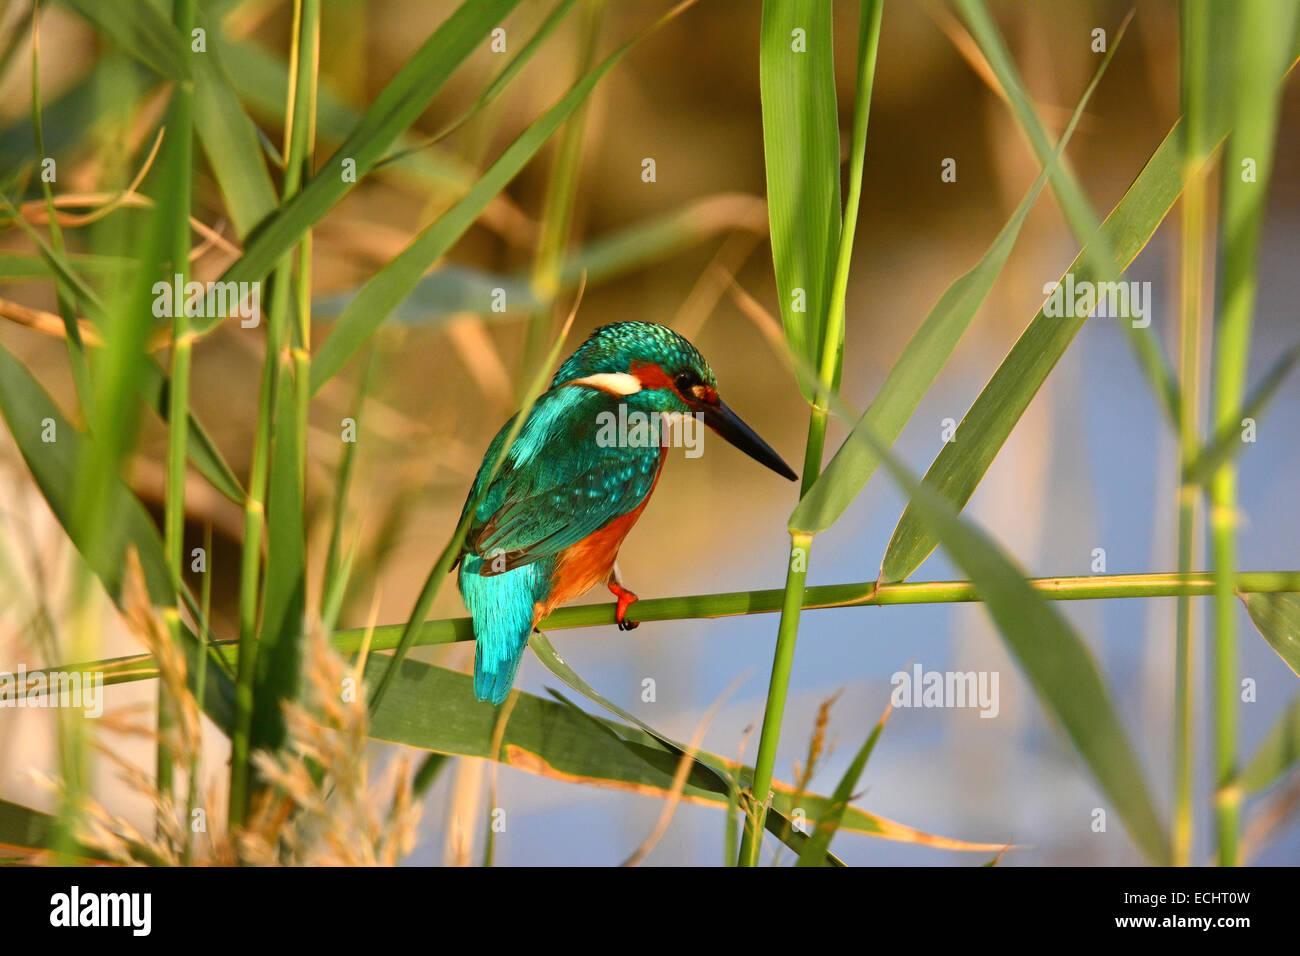 common kingfisher ,Alcedo atthis in its habitat Stock Photo